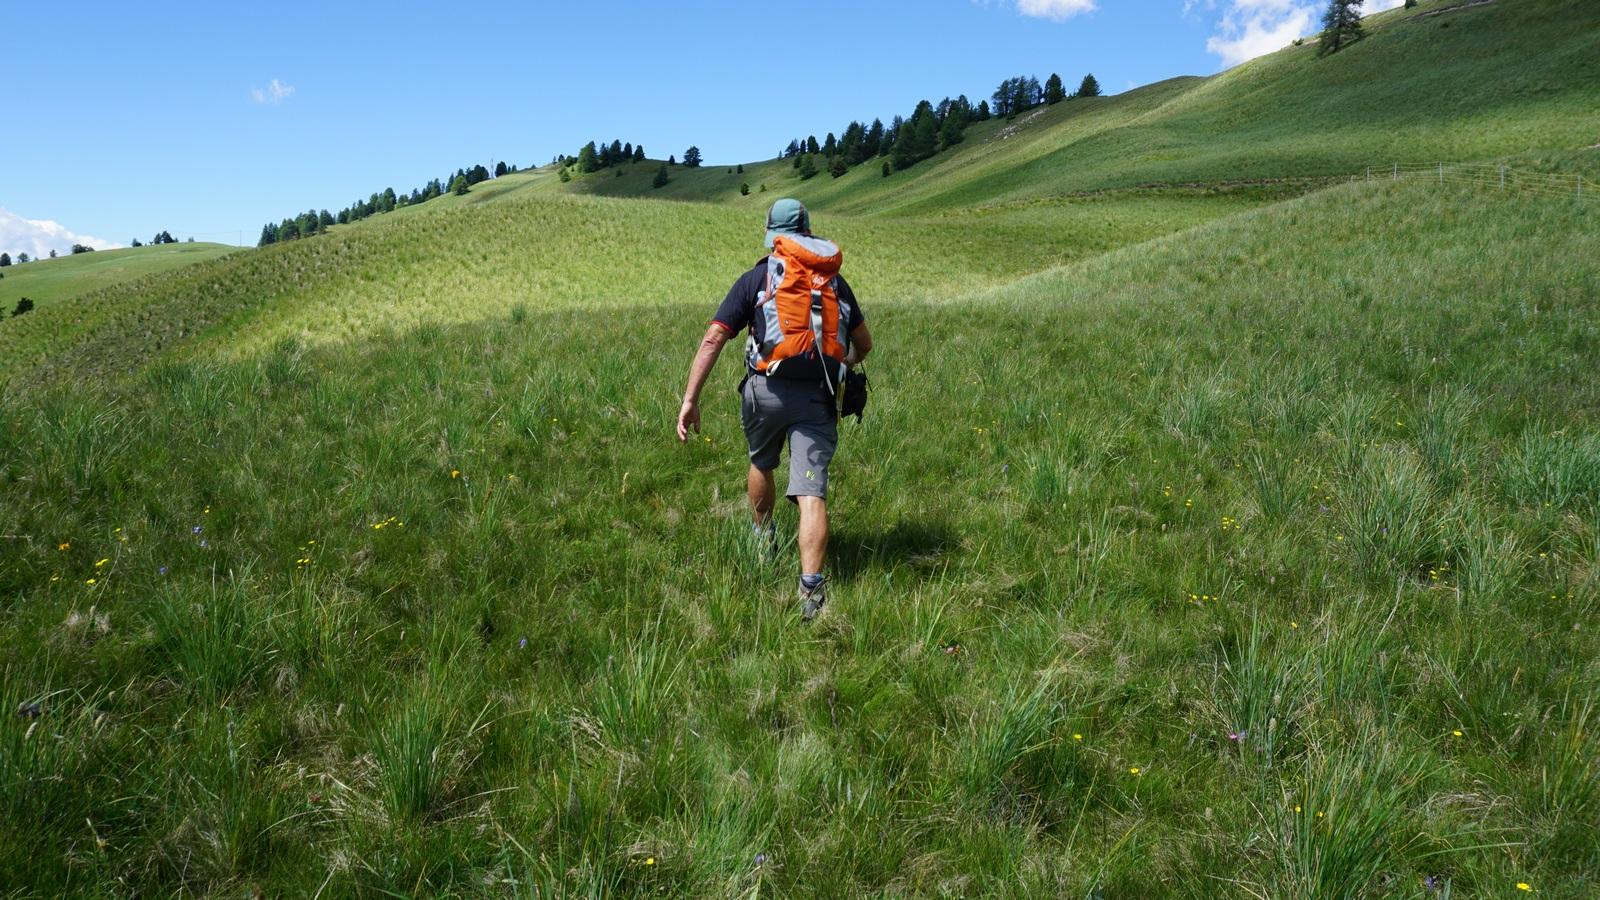 Heading to Peynier summit along alpine meadow